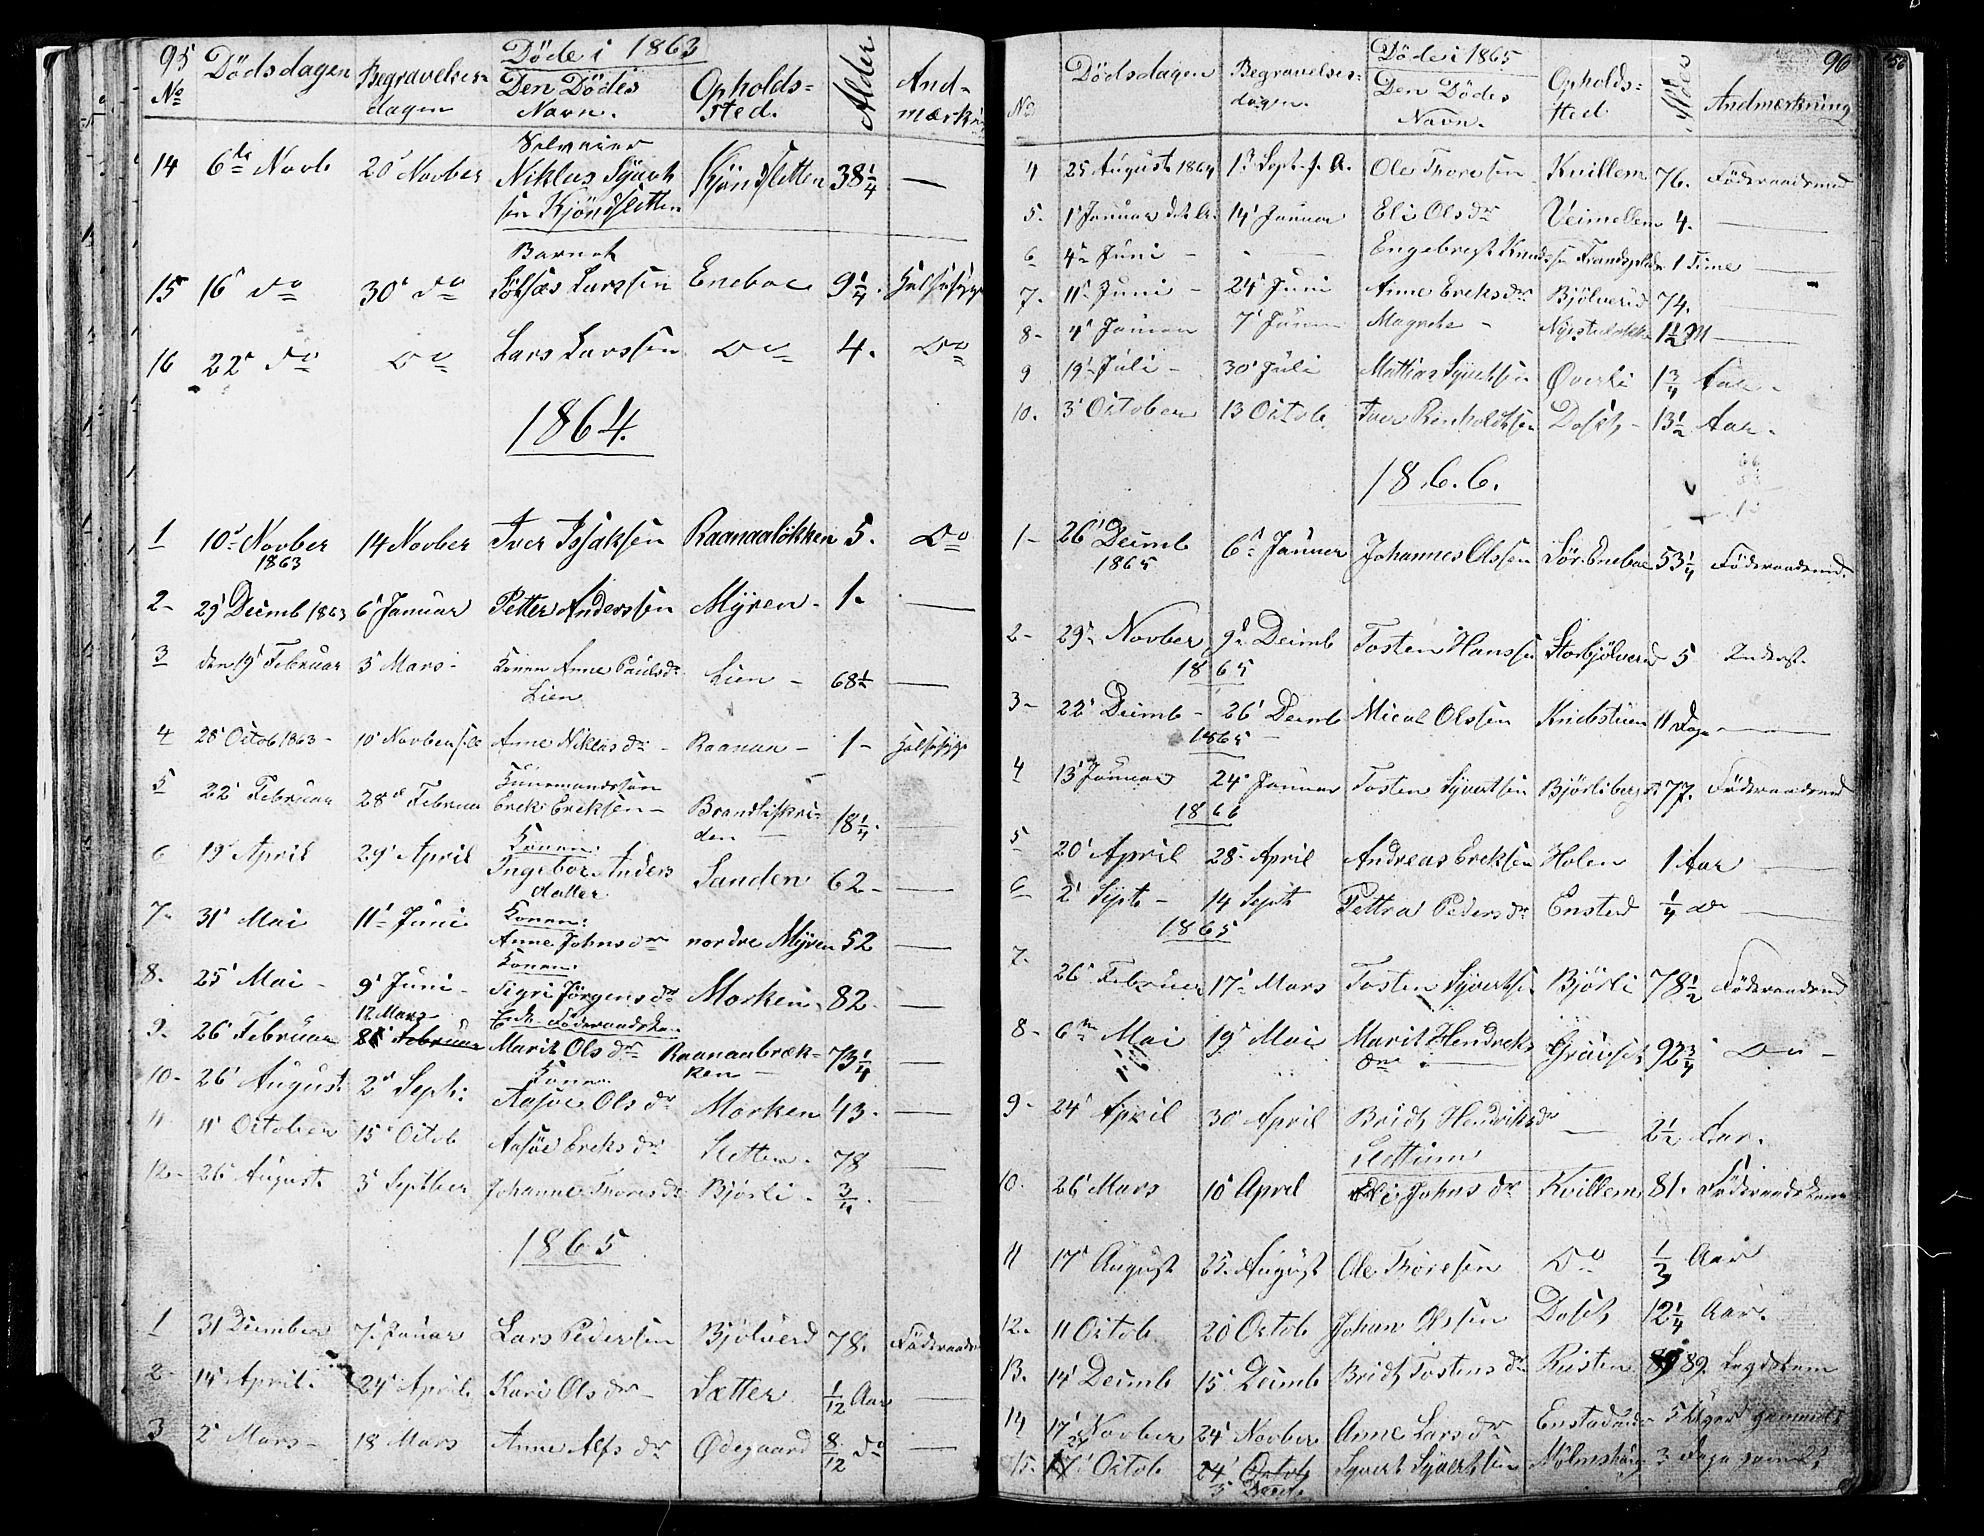 SAH, Lesja prestekontor, Klokkerbok nr. 4, 1842-1871, s. 95-96